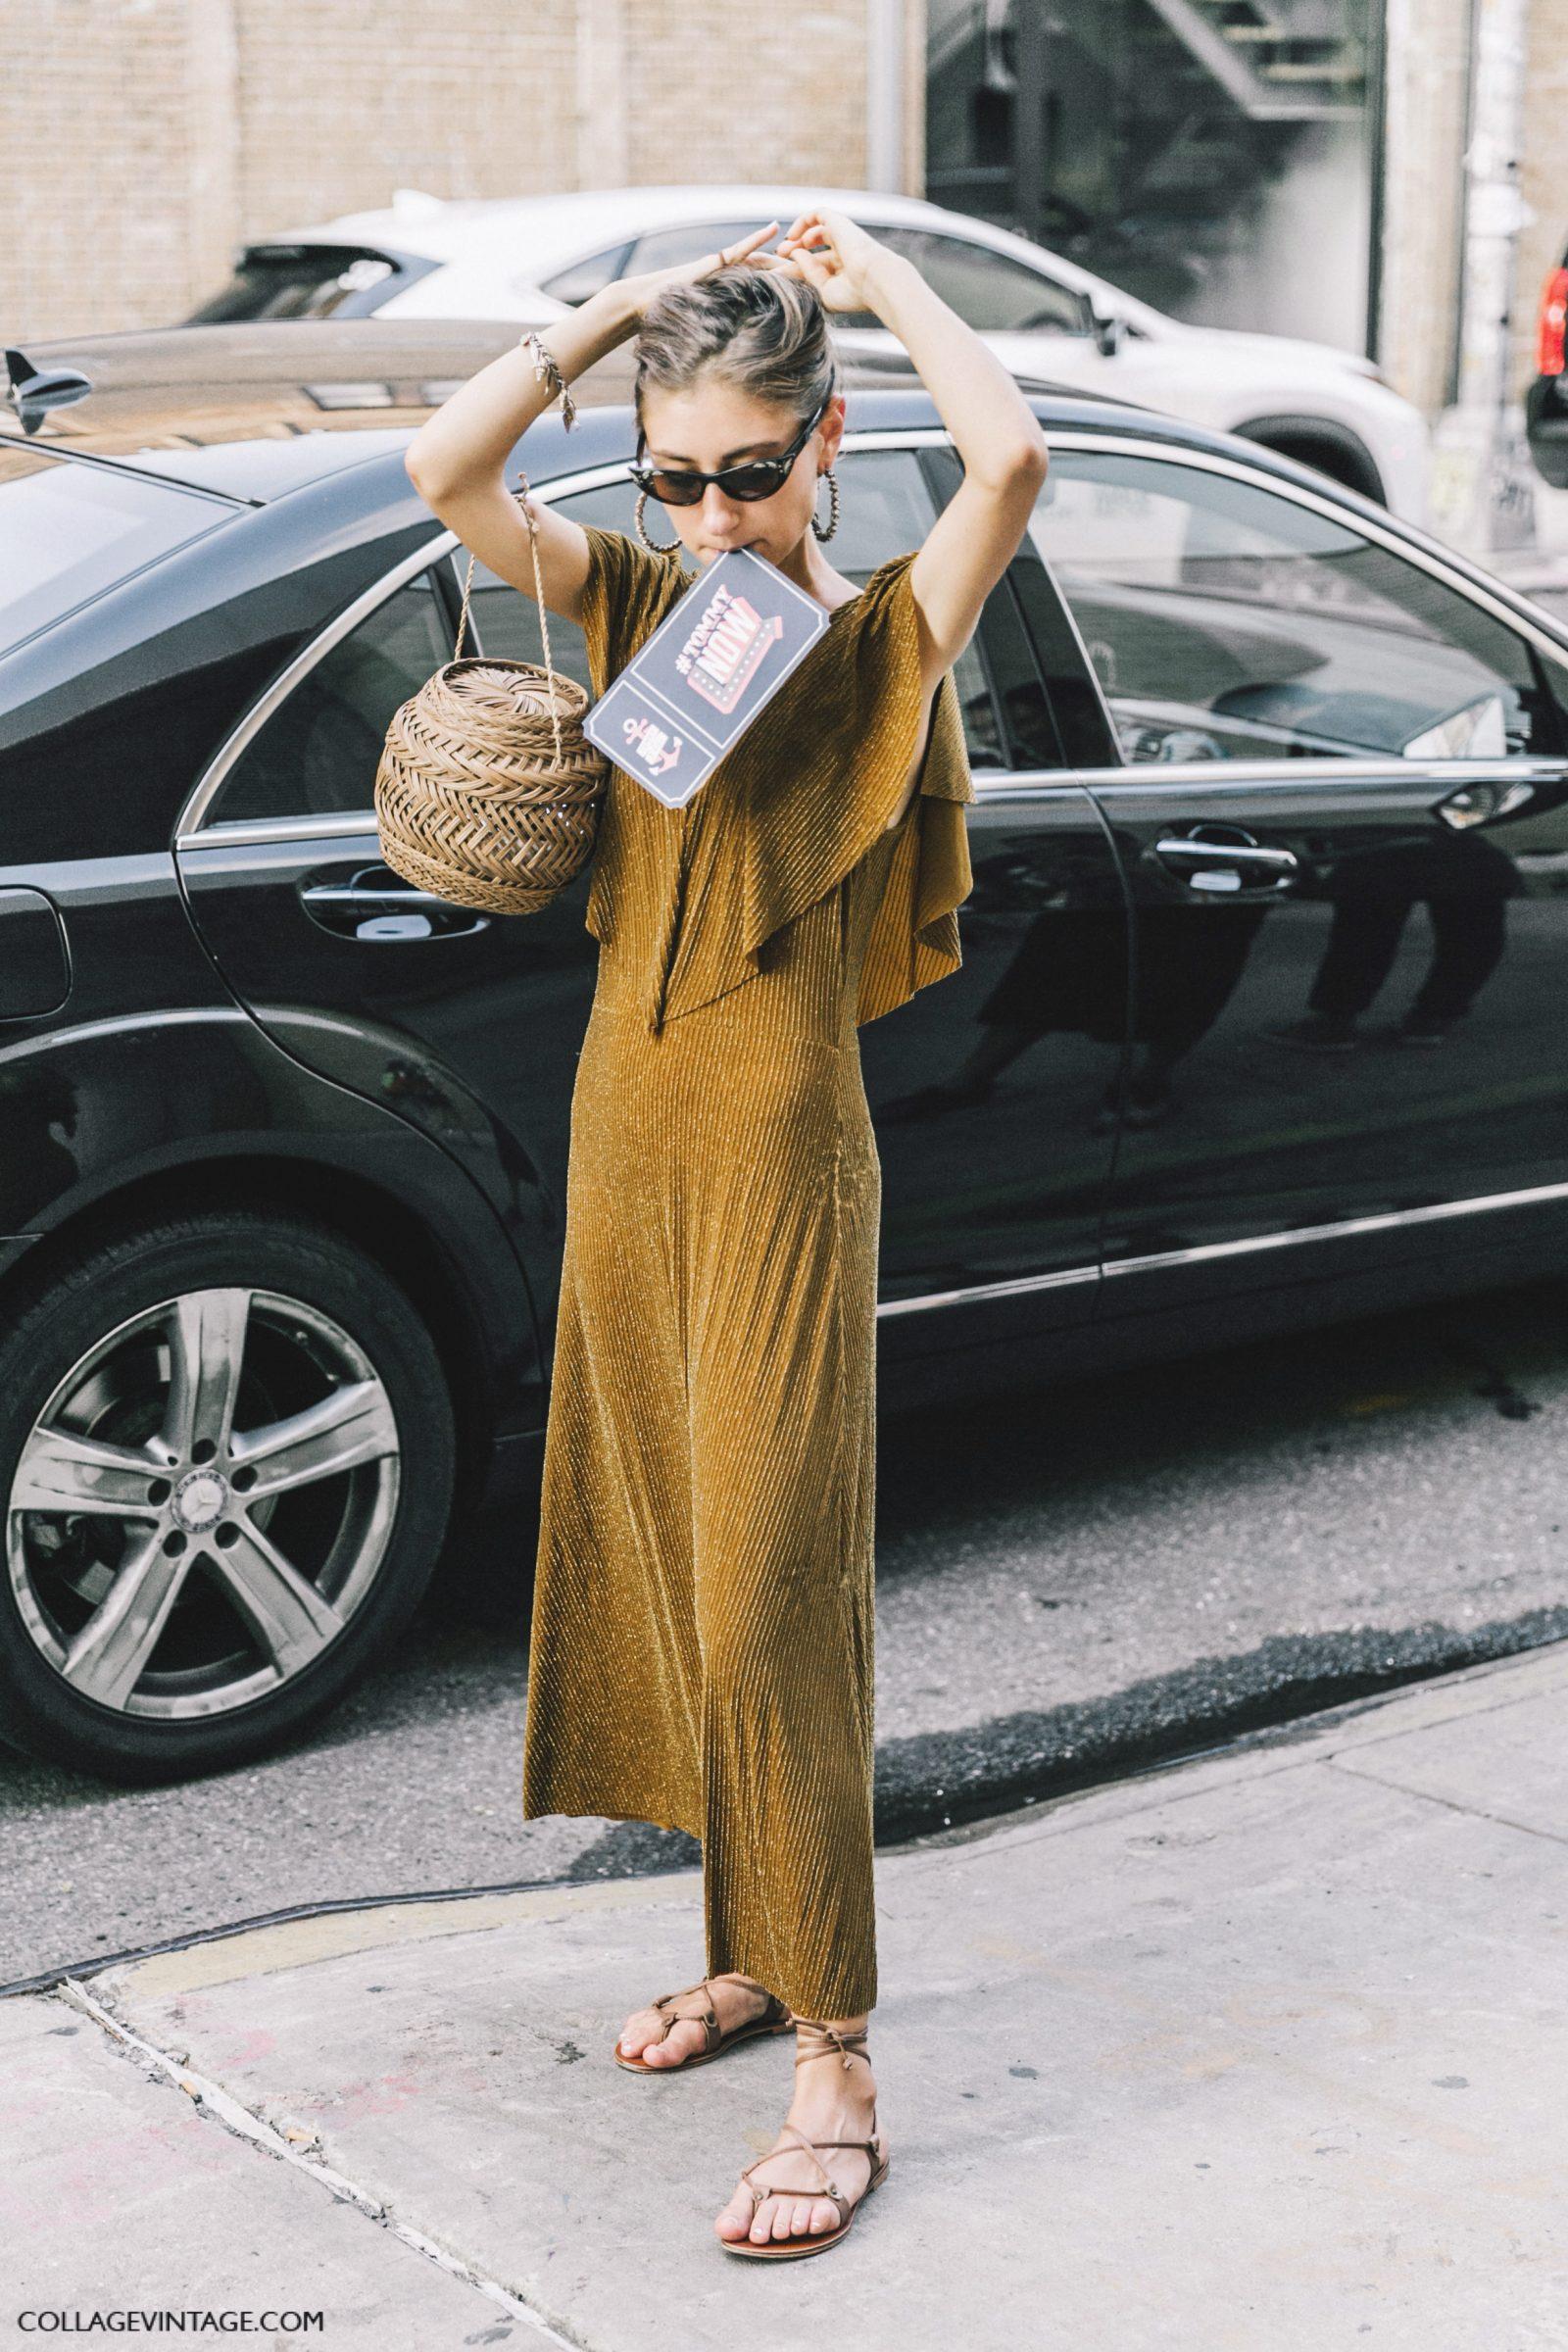 nyfw-new_york_fashion_week_ss17-street_style-outfits-collage_vintage-zara_dress-basket-knotted_sandals-jenny_walton